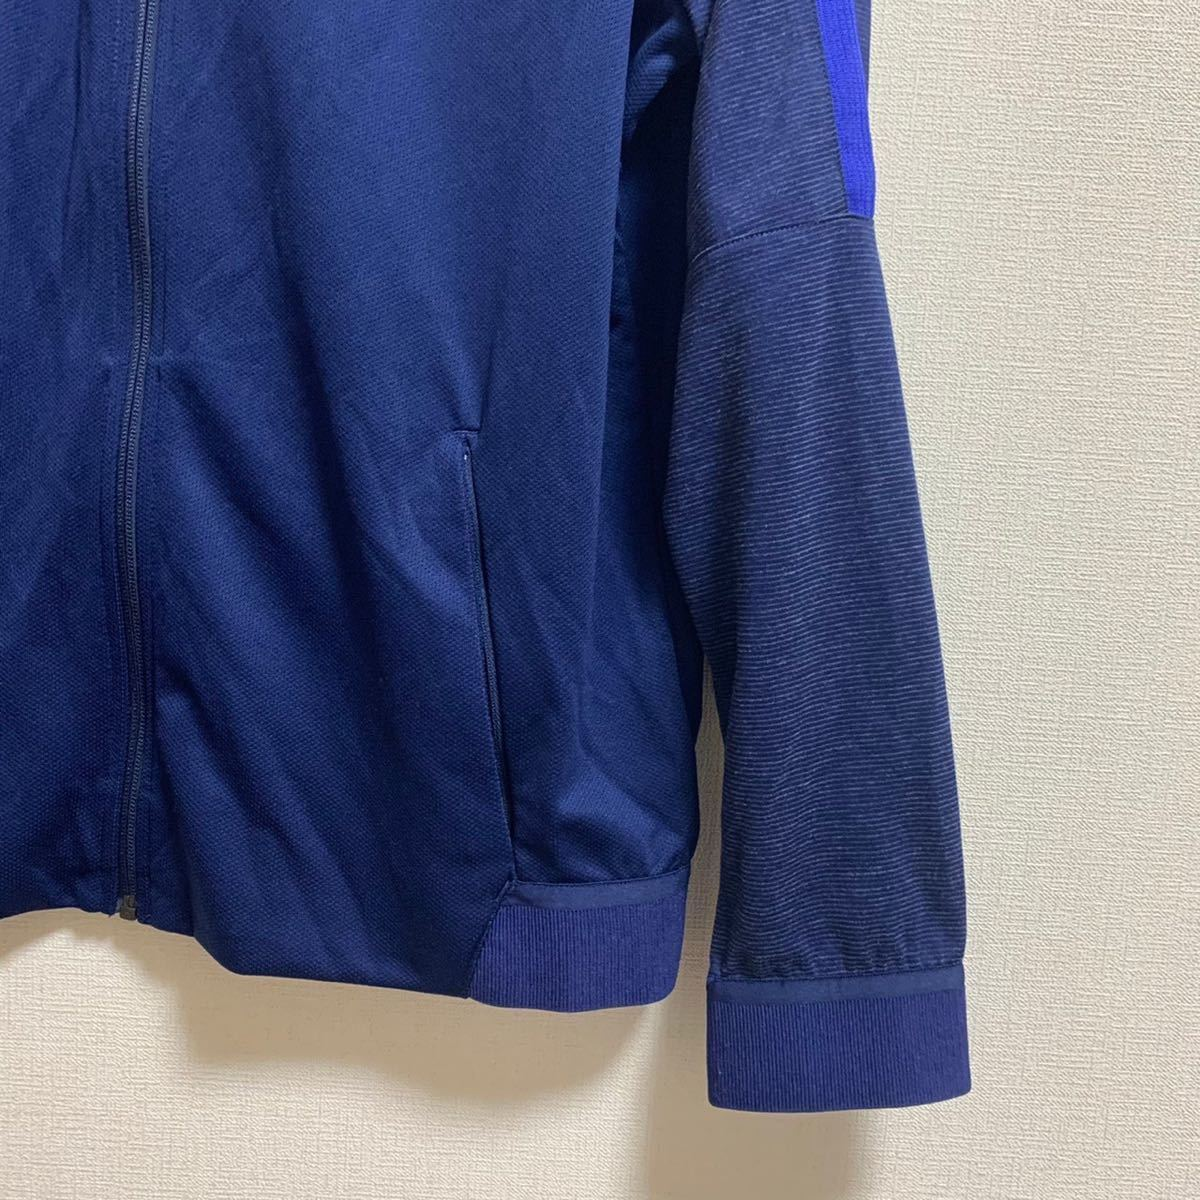 【XXL】NIKE トラックジャケット ネイビー ナイキ トレーニングウェア スポーツウェア ランニングウェア 部活